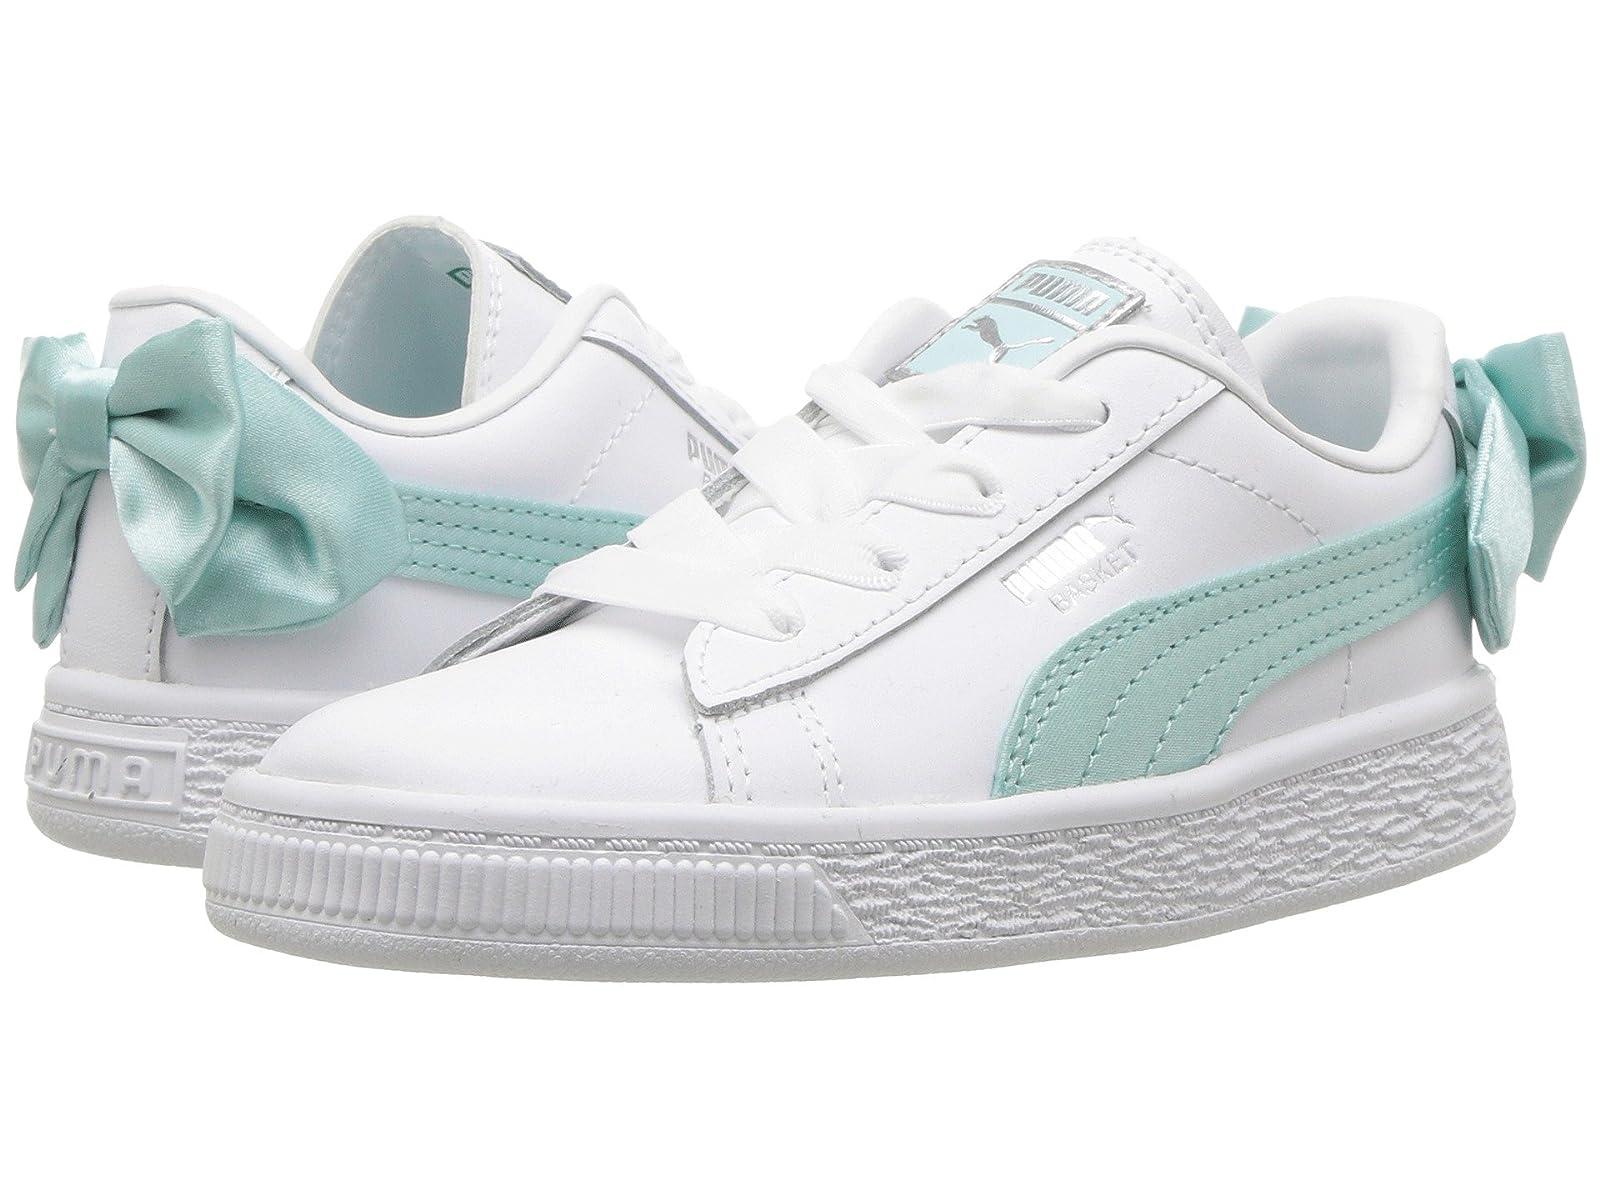 Puma Kids Basket Bow AC INF (Toddler)Atmospheric grades have affordable shoes